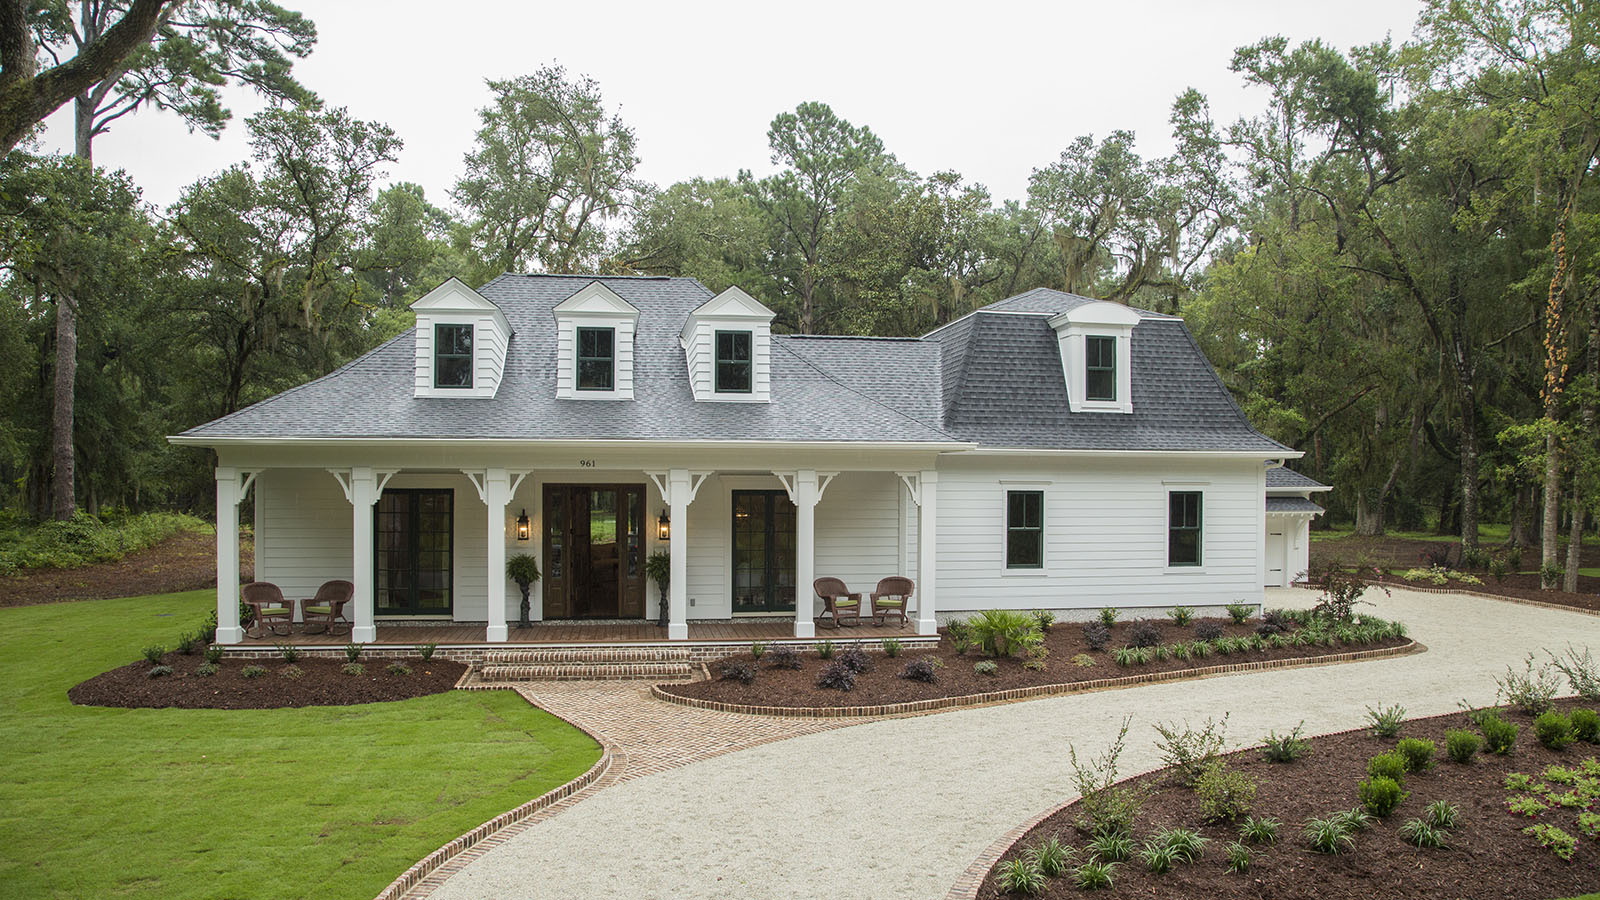 Fullsize Of Southern House Plans